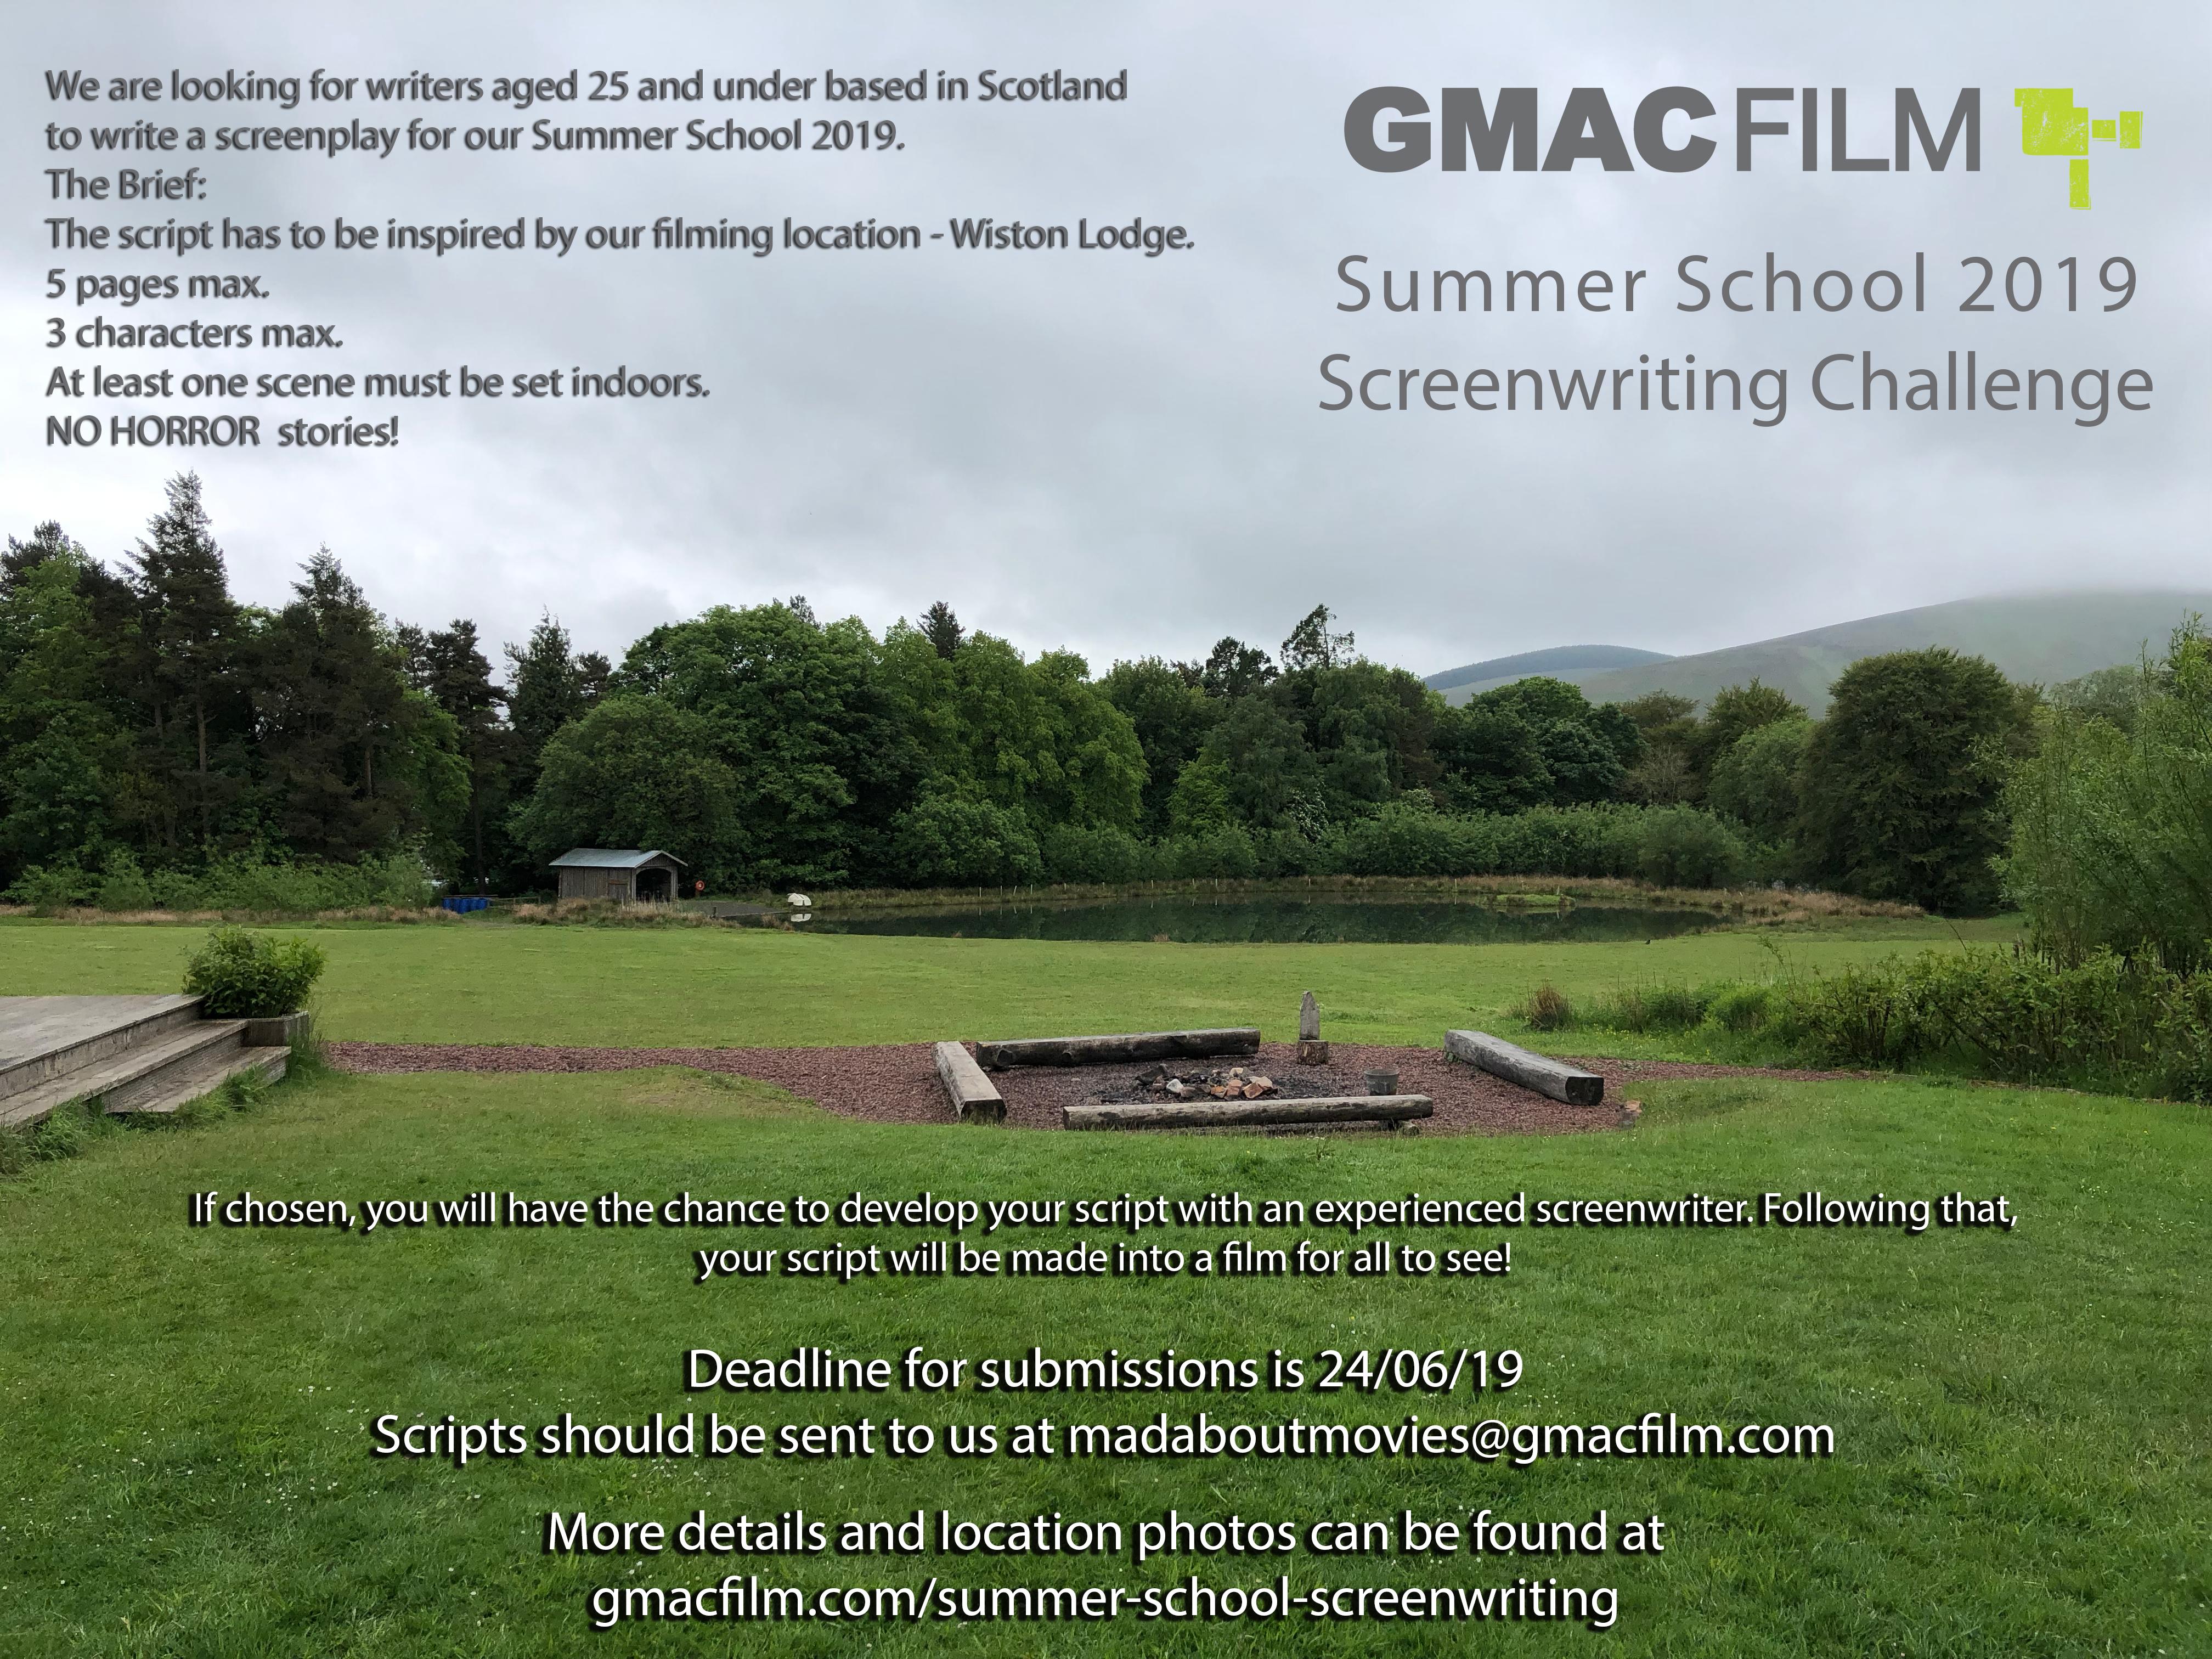 Summer School Screenwriting Challenge